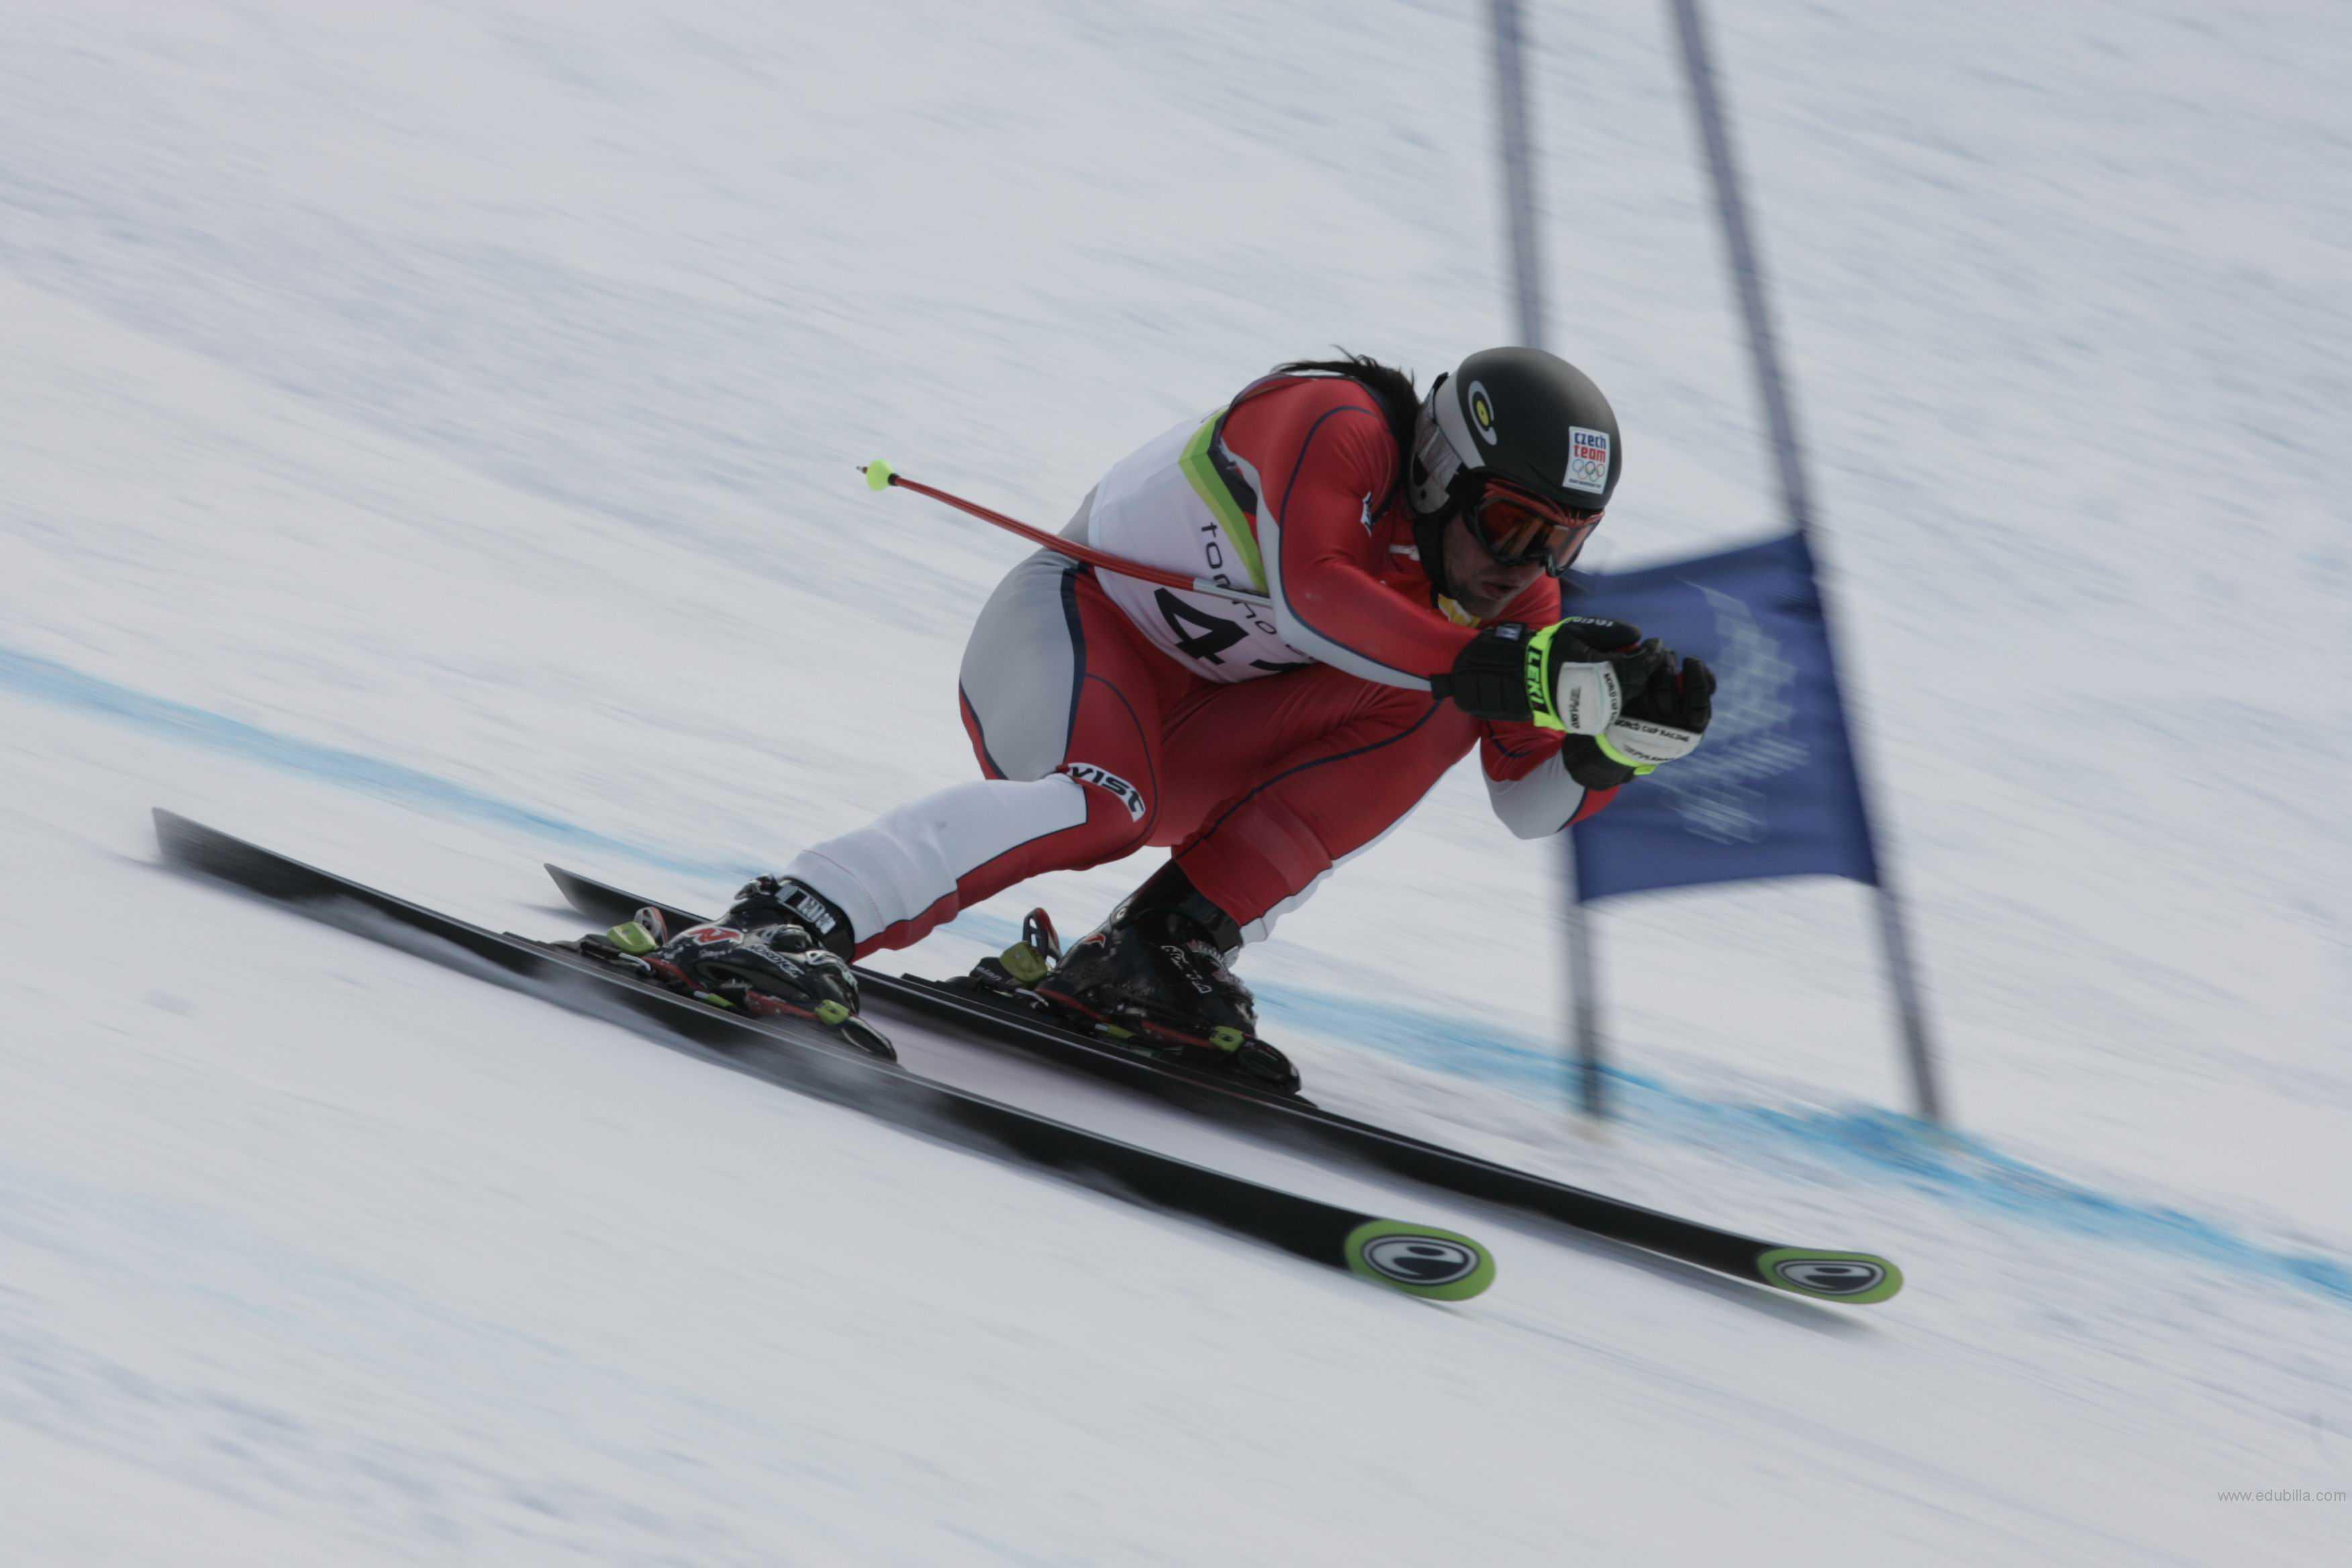 alpine_skiing7.jpg